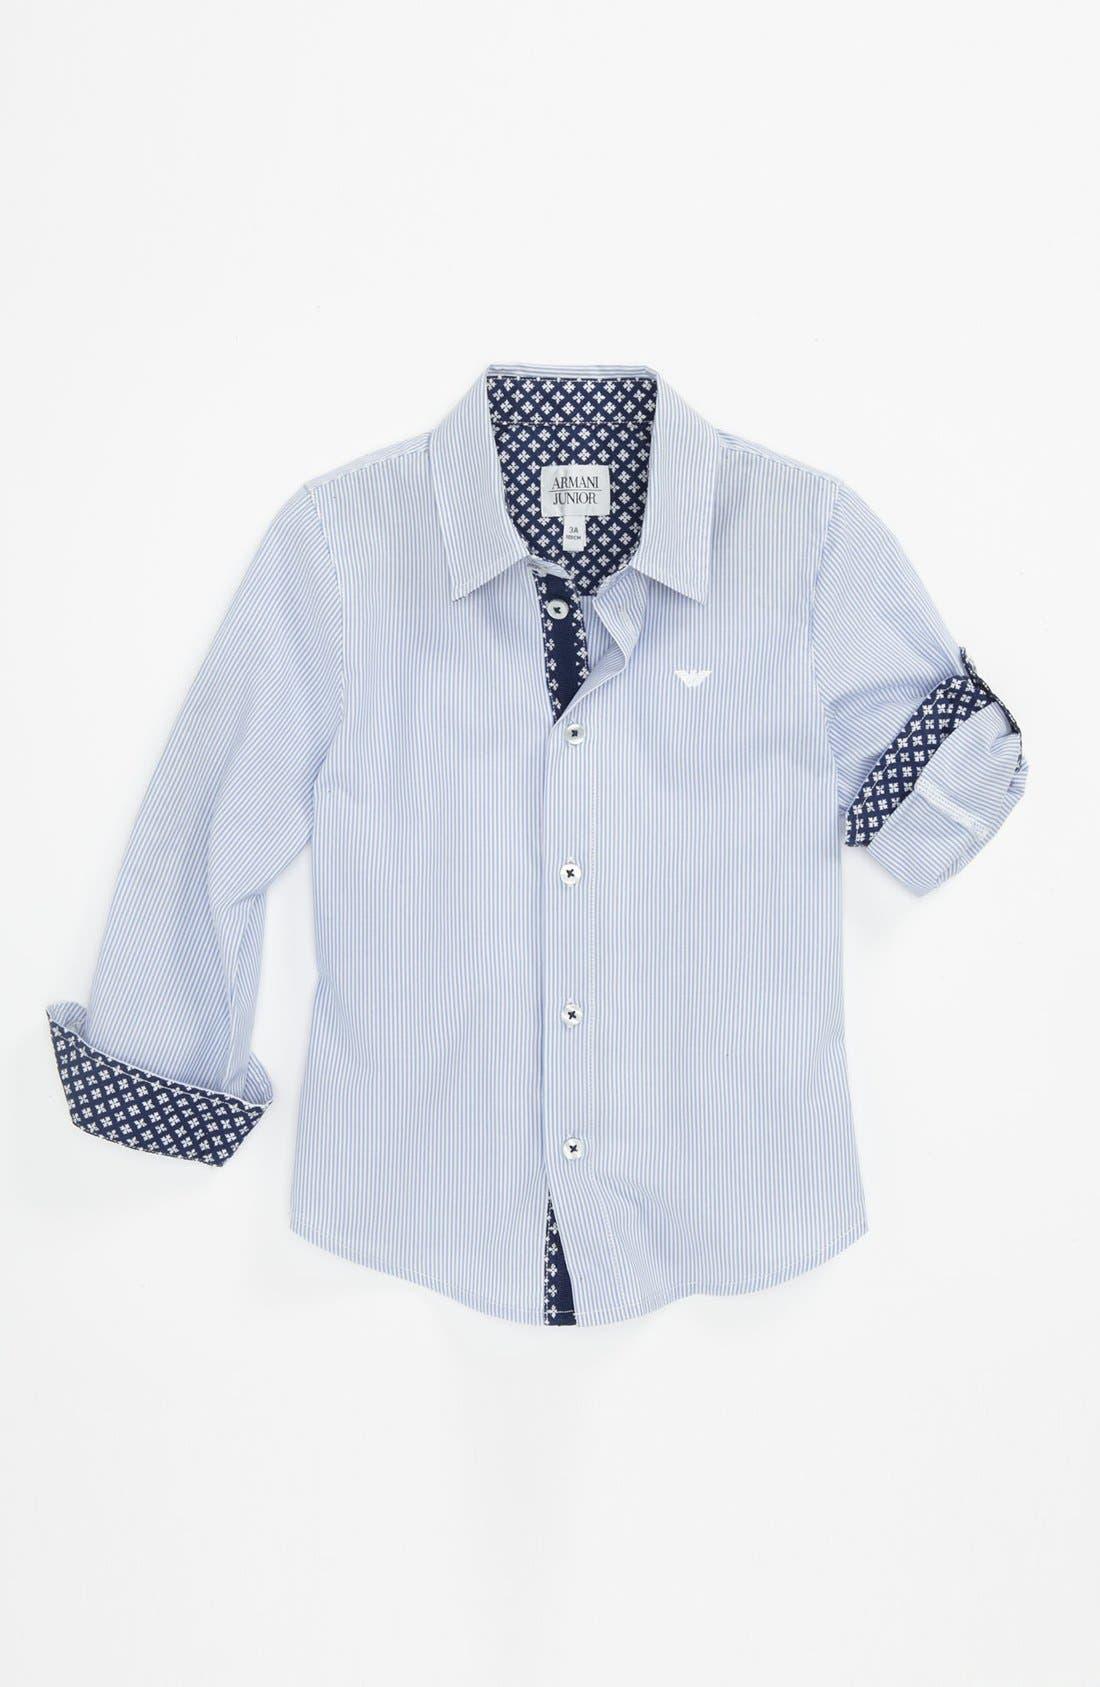 Main Image - Armani Junior Stripe Shirt (Little Boys)